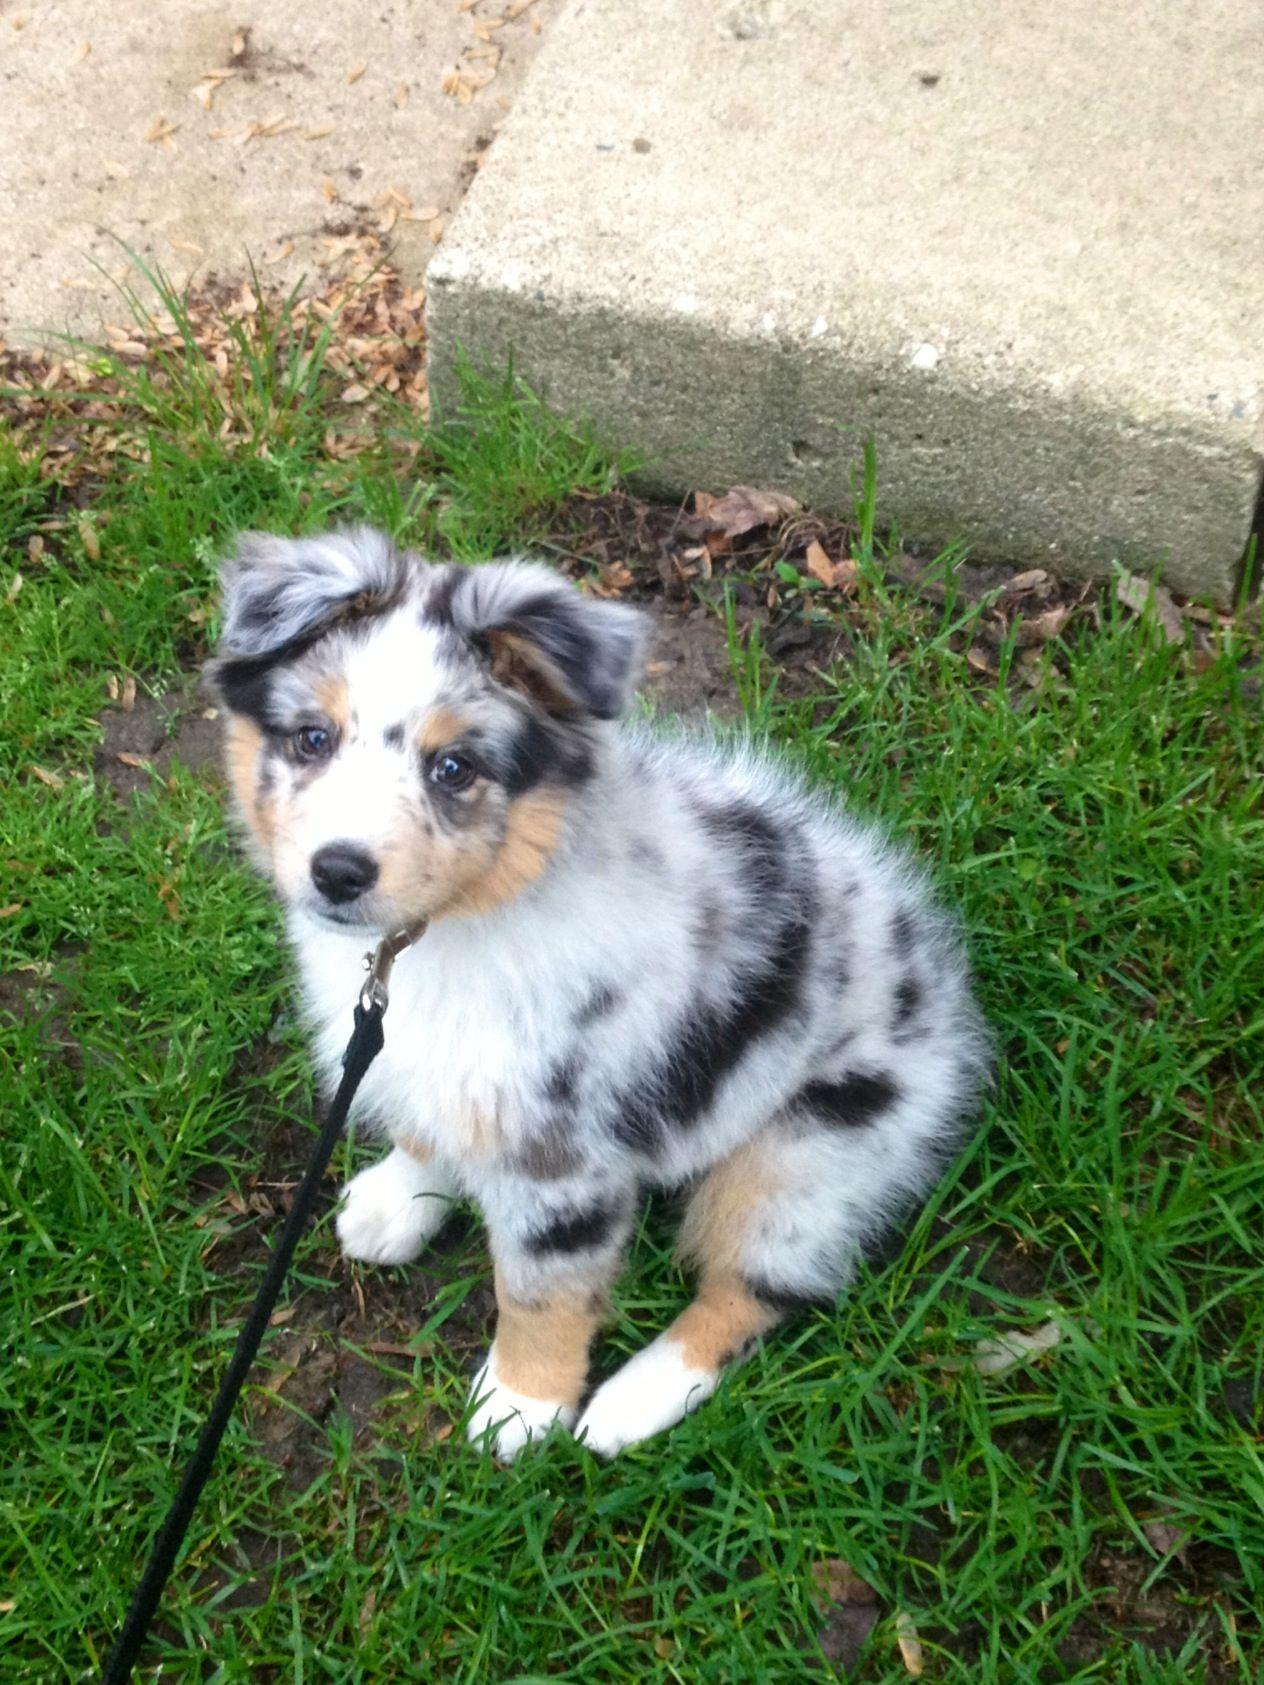 Our miniature Austrailian shepherd puppy Trooper Aussie